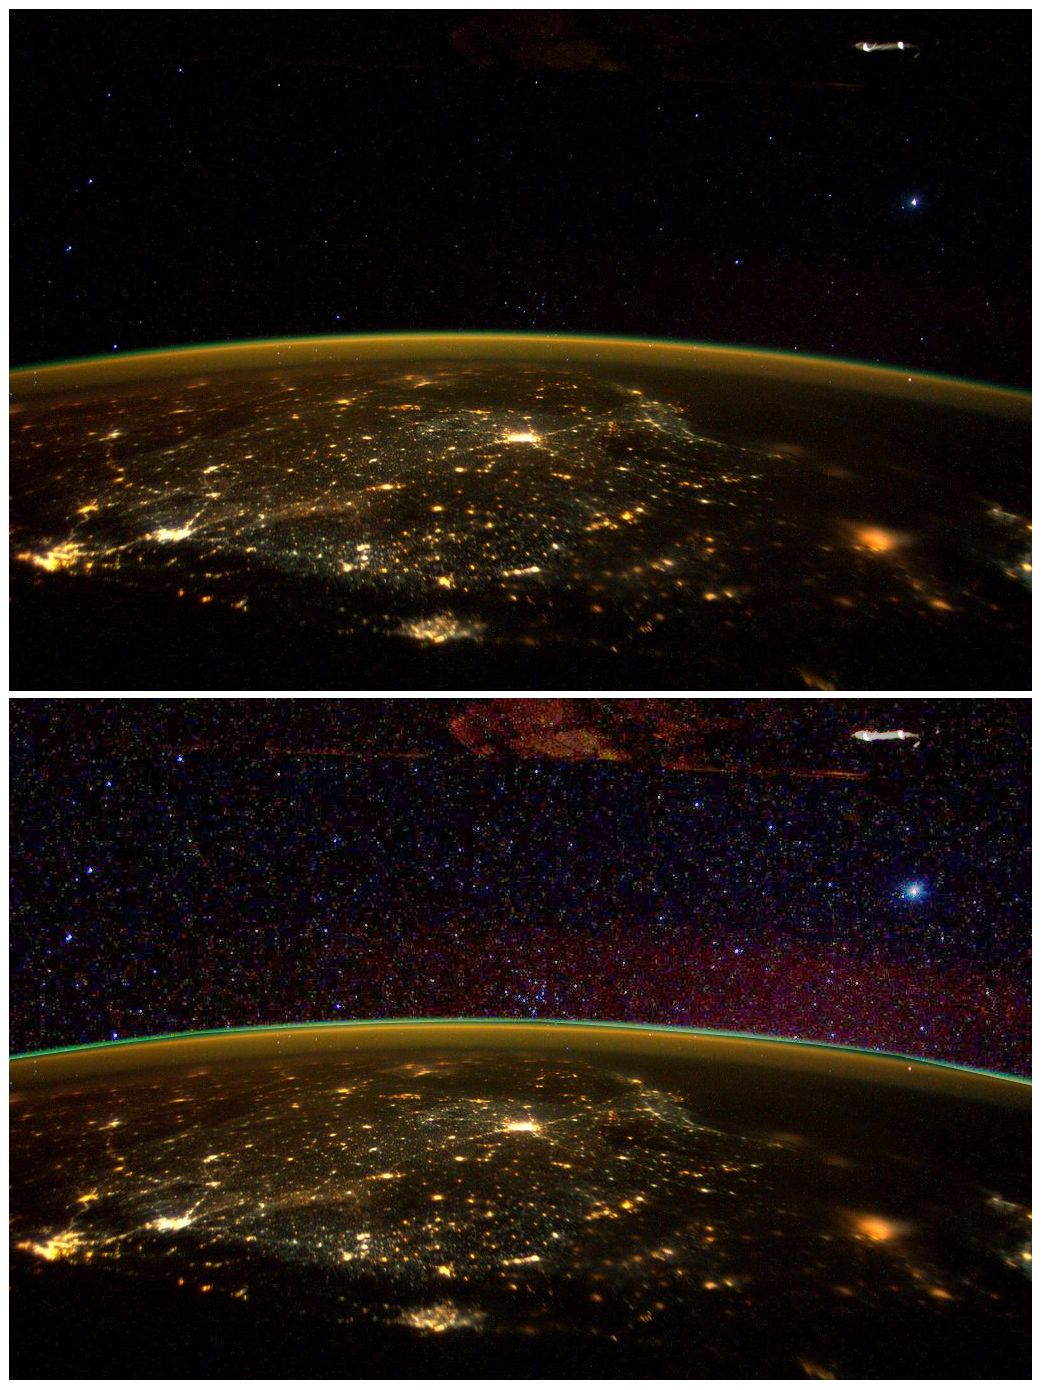 OVNI - UFO - Phénomènes aérospatiaux non identifiés -  Scott Kelly - ISS - Décryptage - réseaux sociaux - GEIPAN - NASA